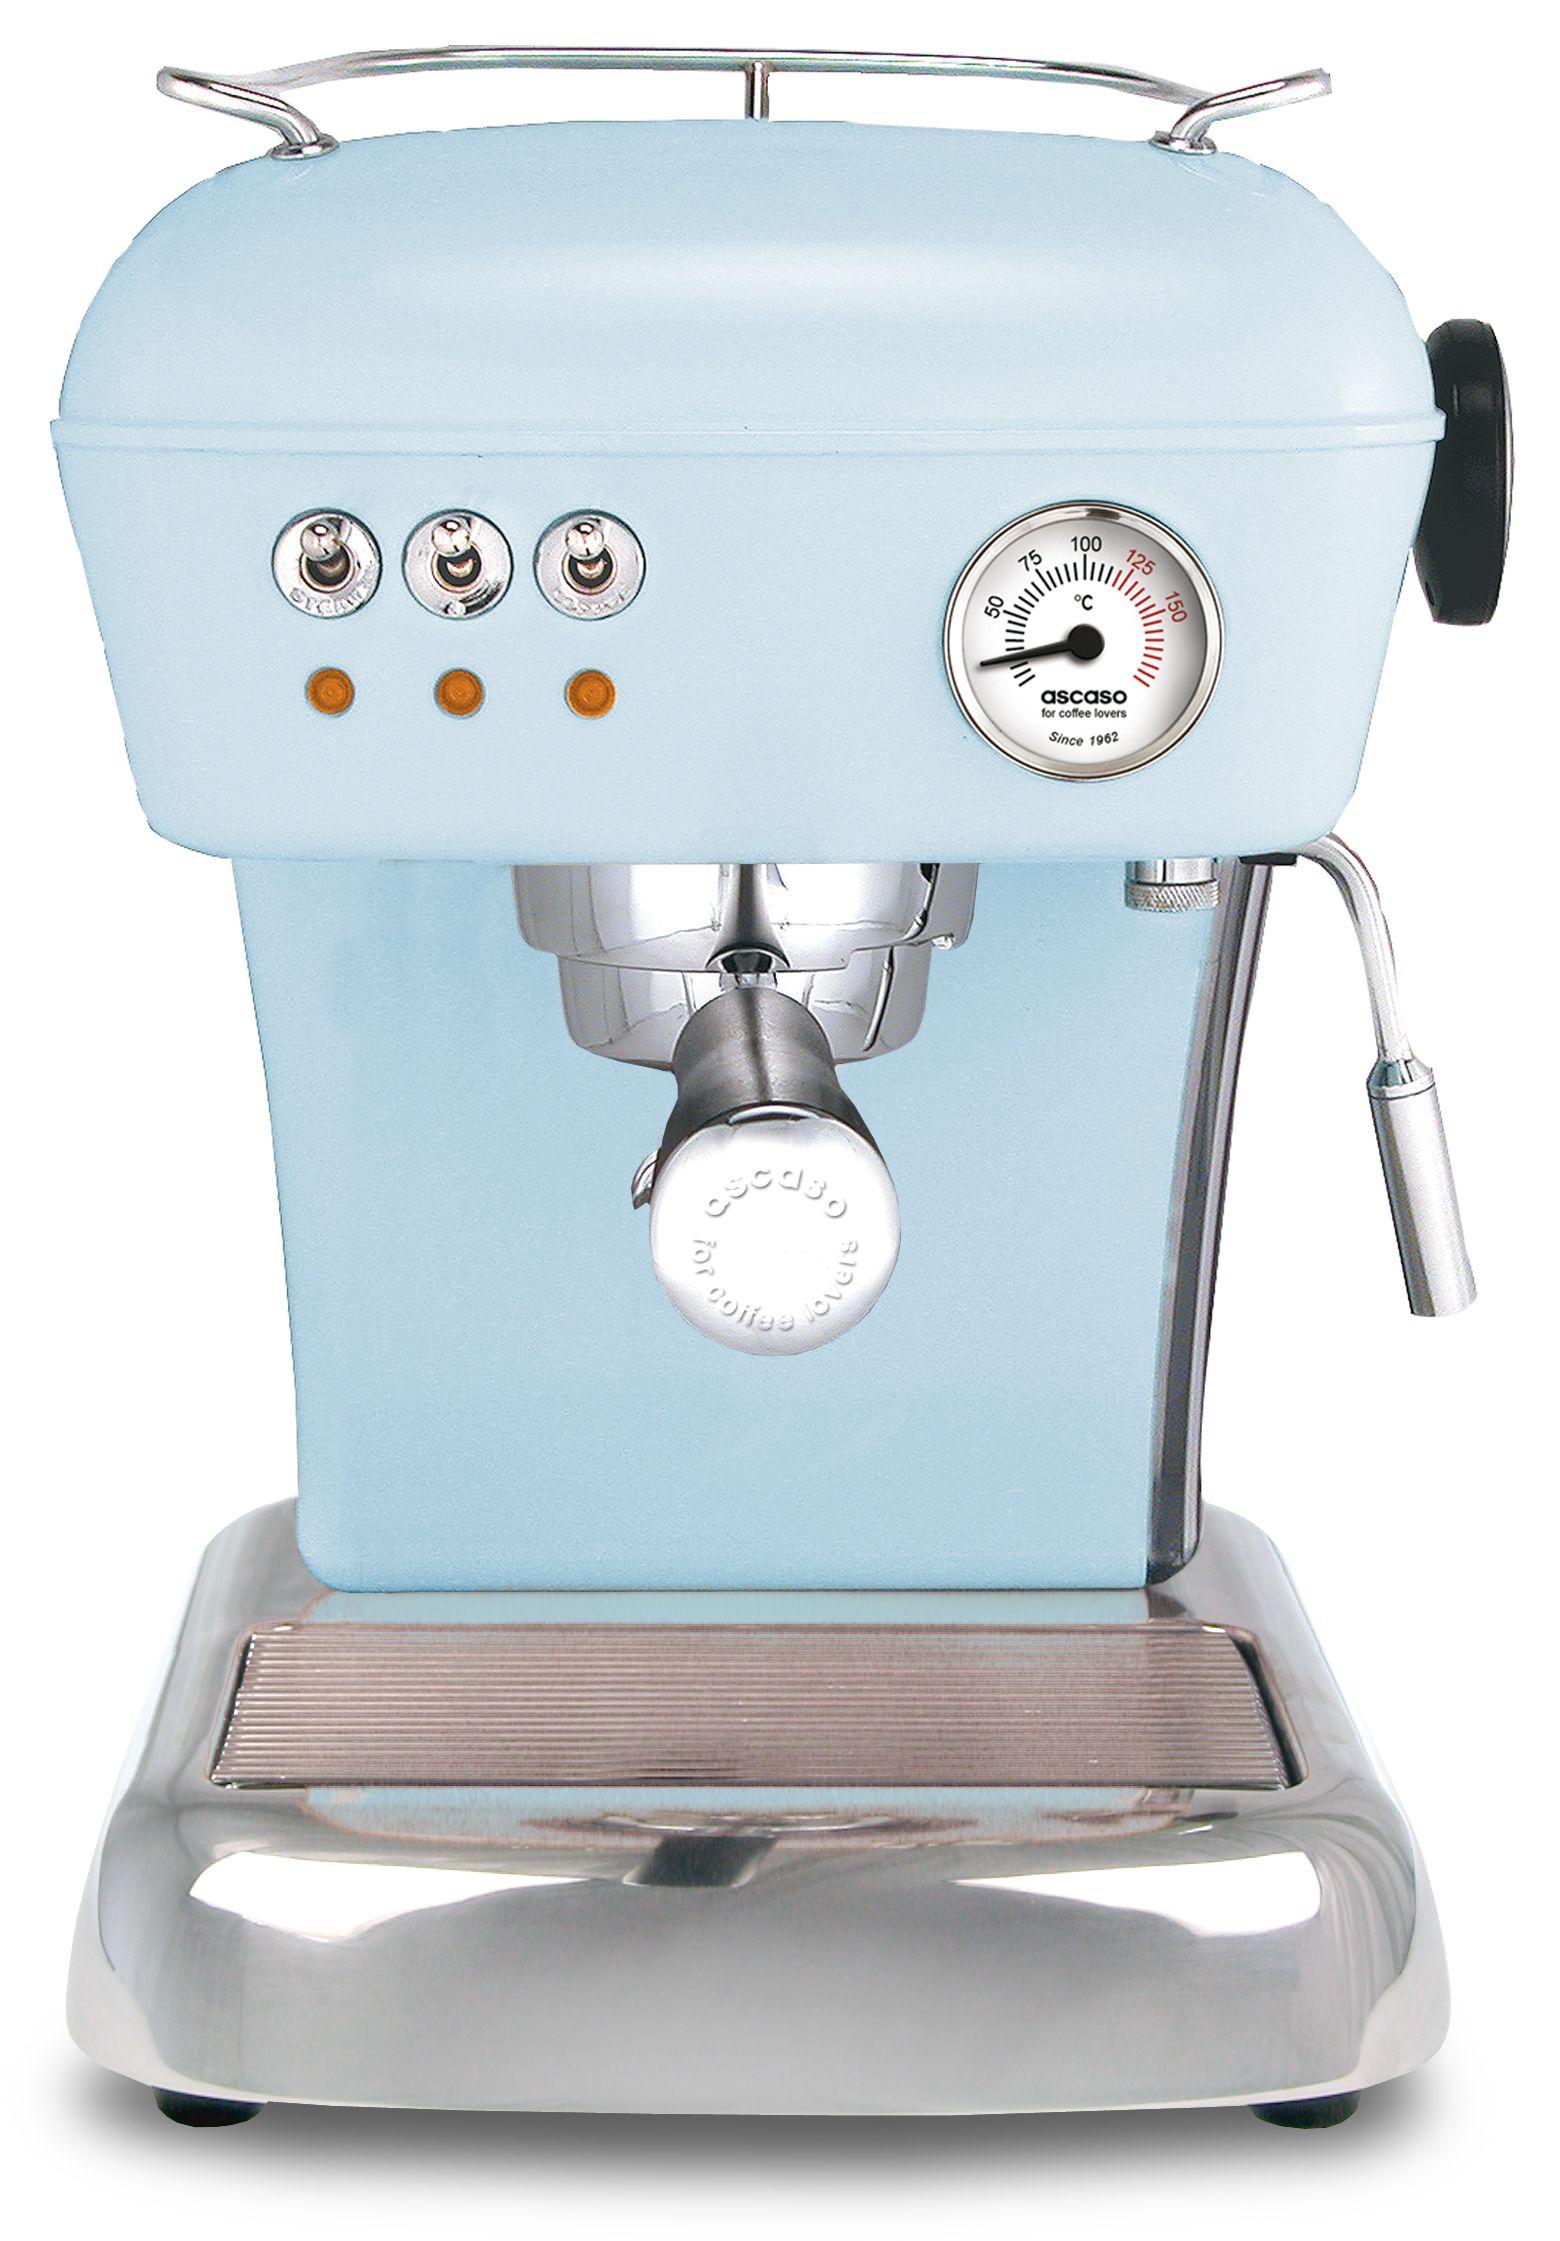 Ascaso Dream Espresso Machine Gimme Ascaso Dream Espresso Machine Best Espresso Machine Espresso Machine